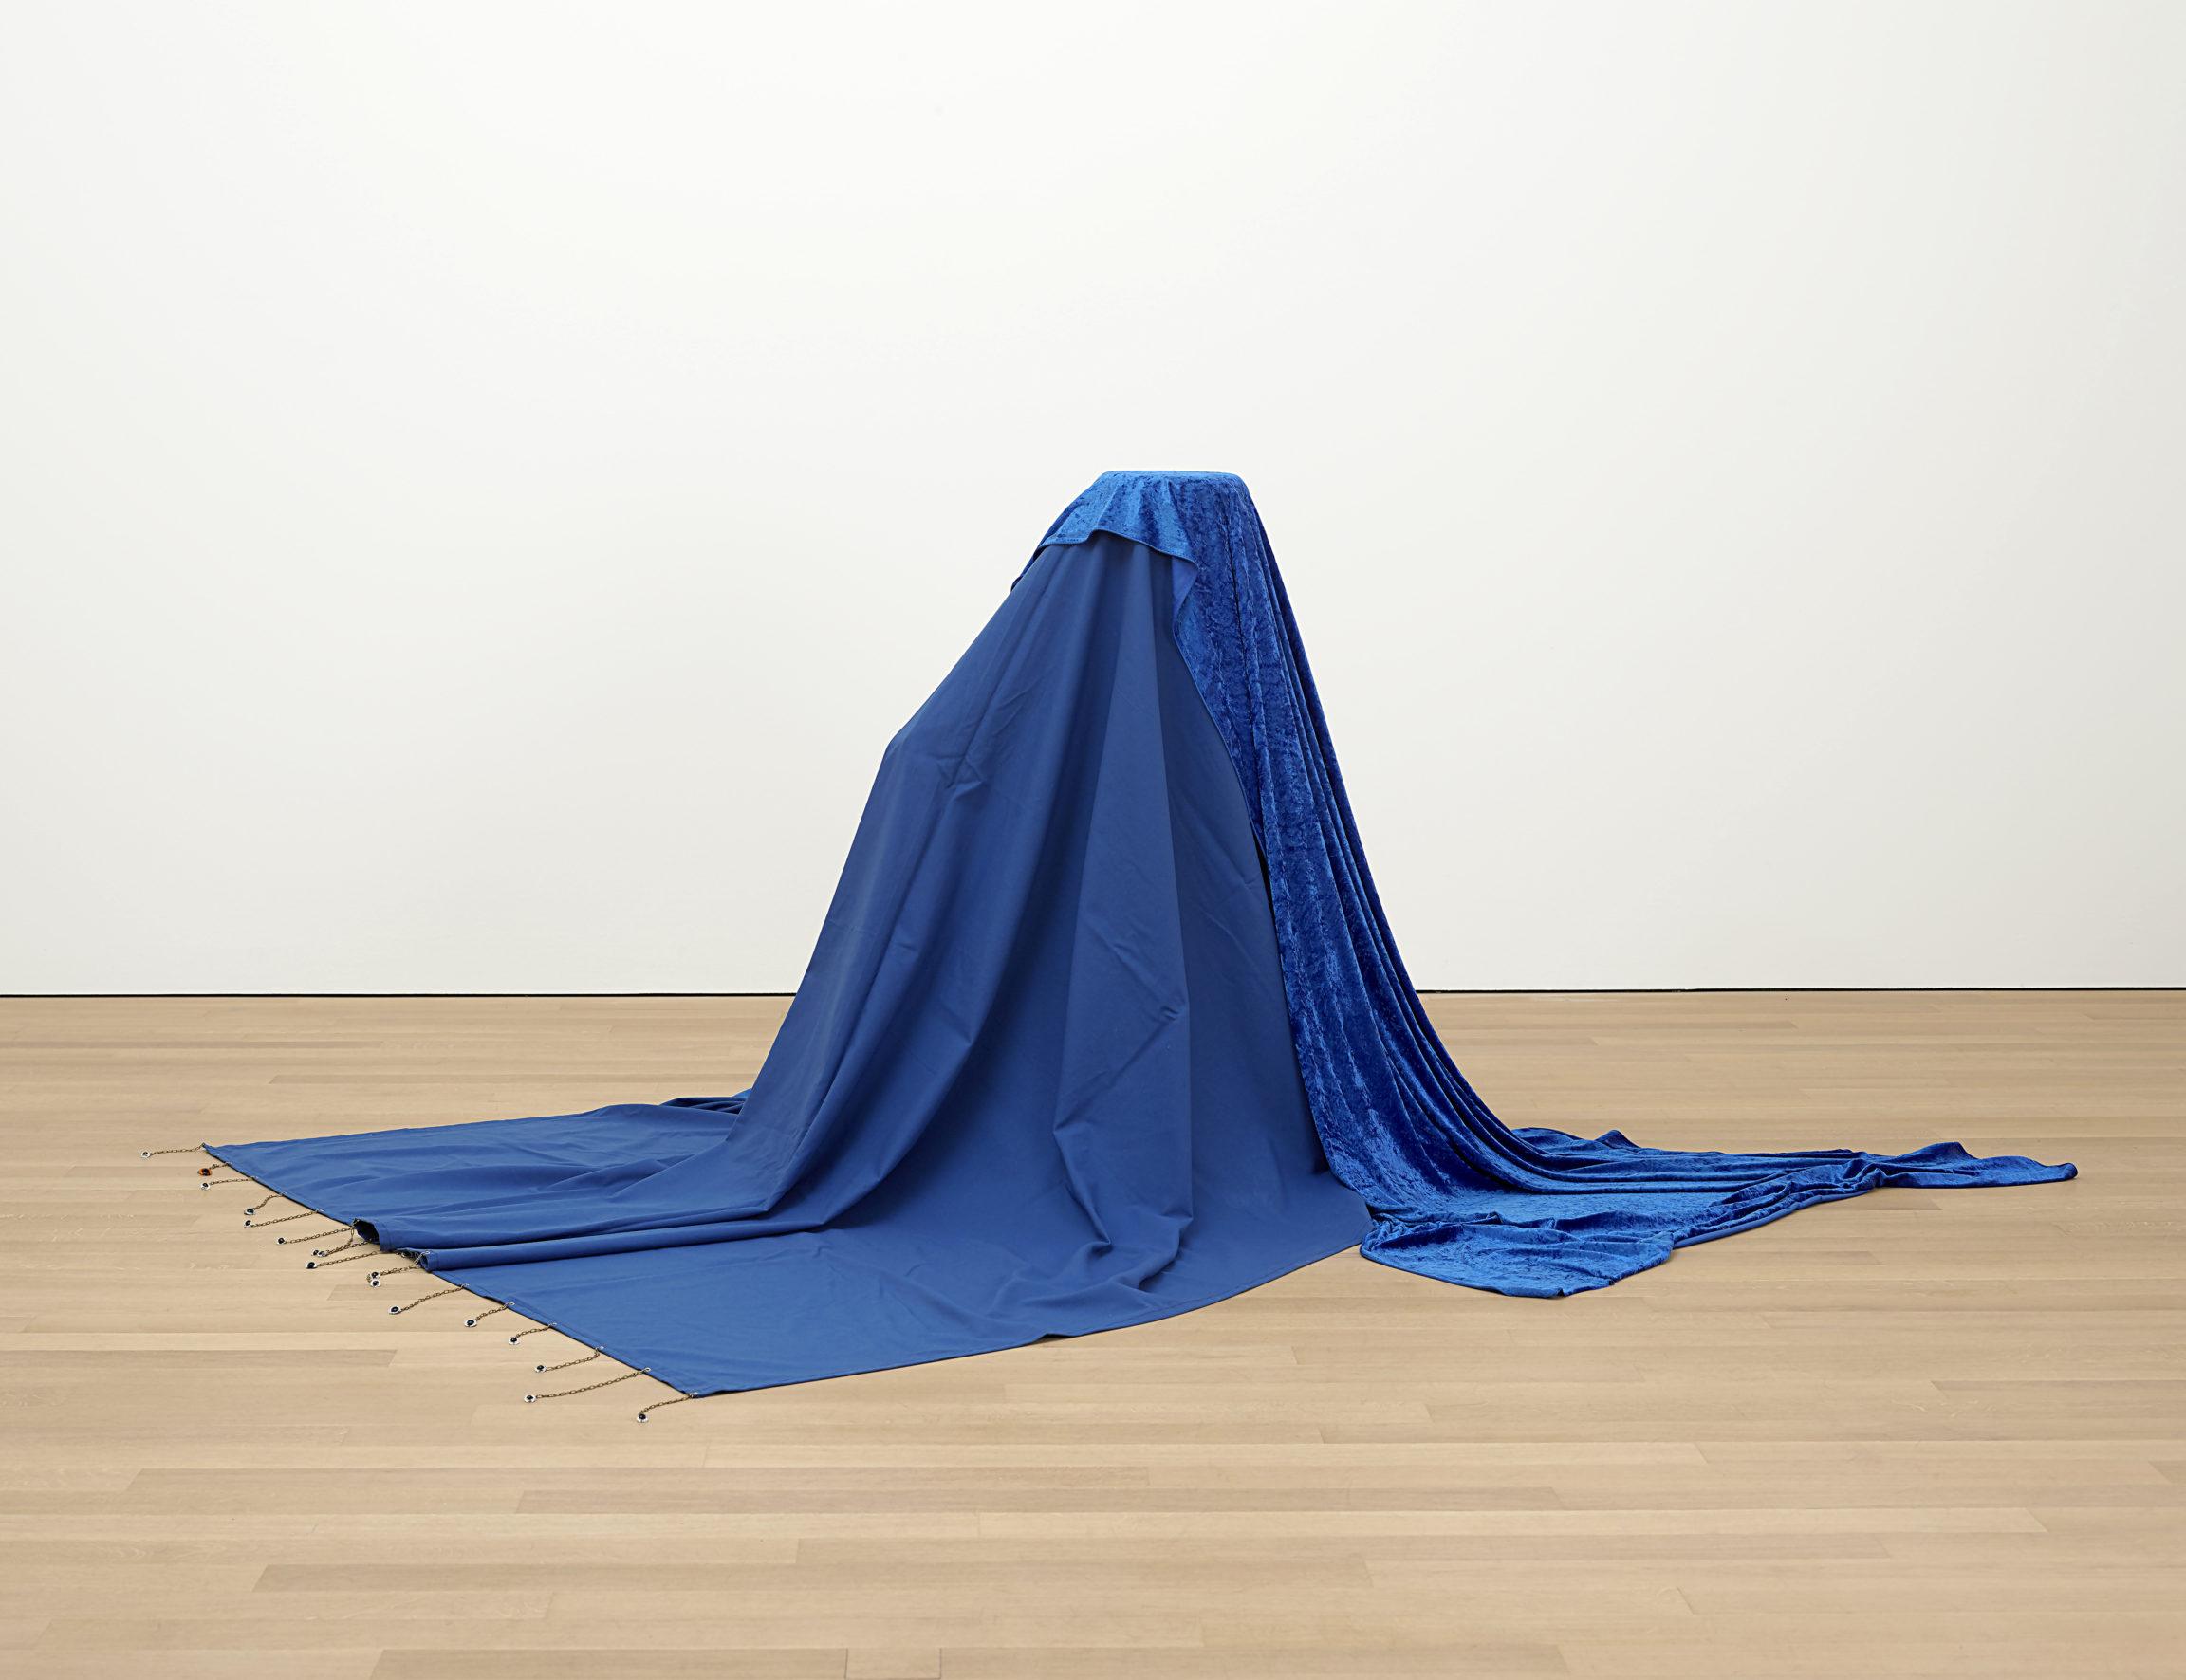 Delphine Coindet, Le cyclope, 2011